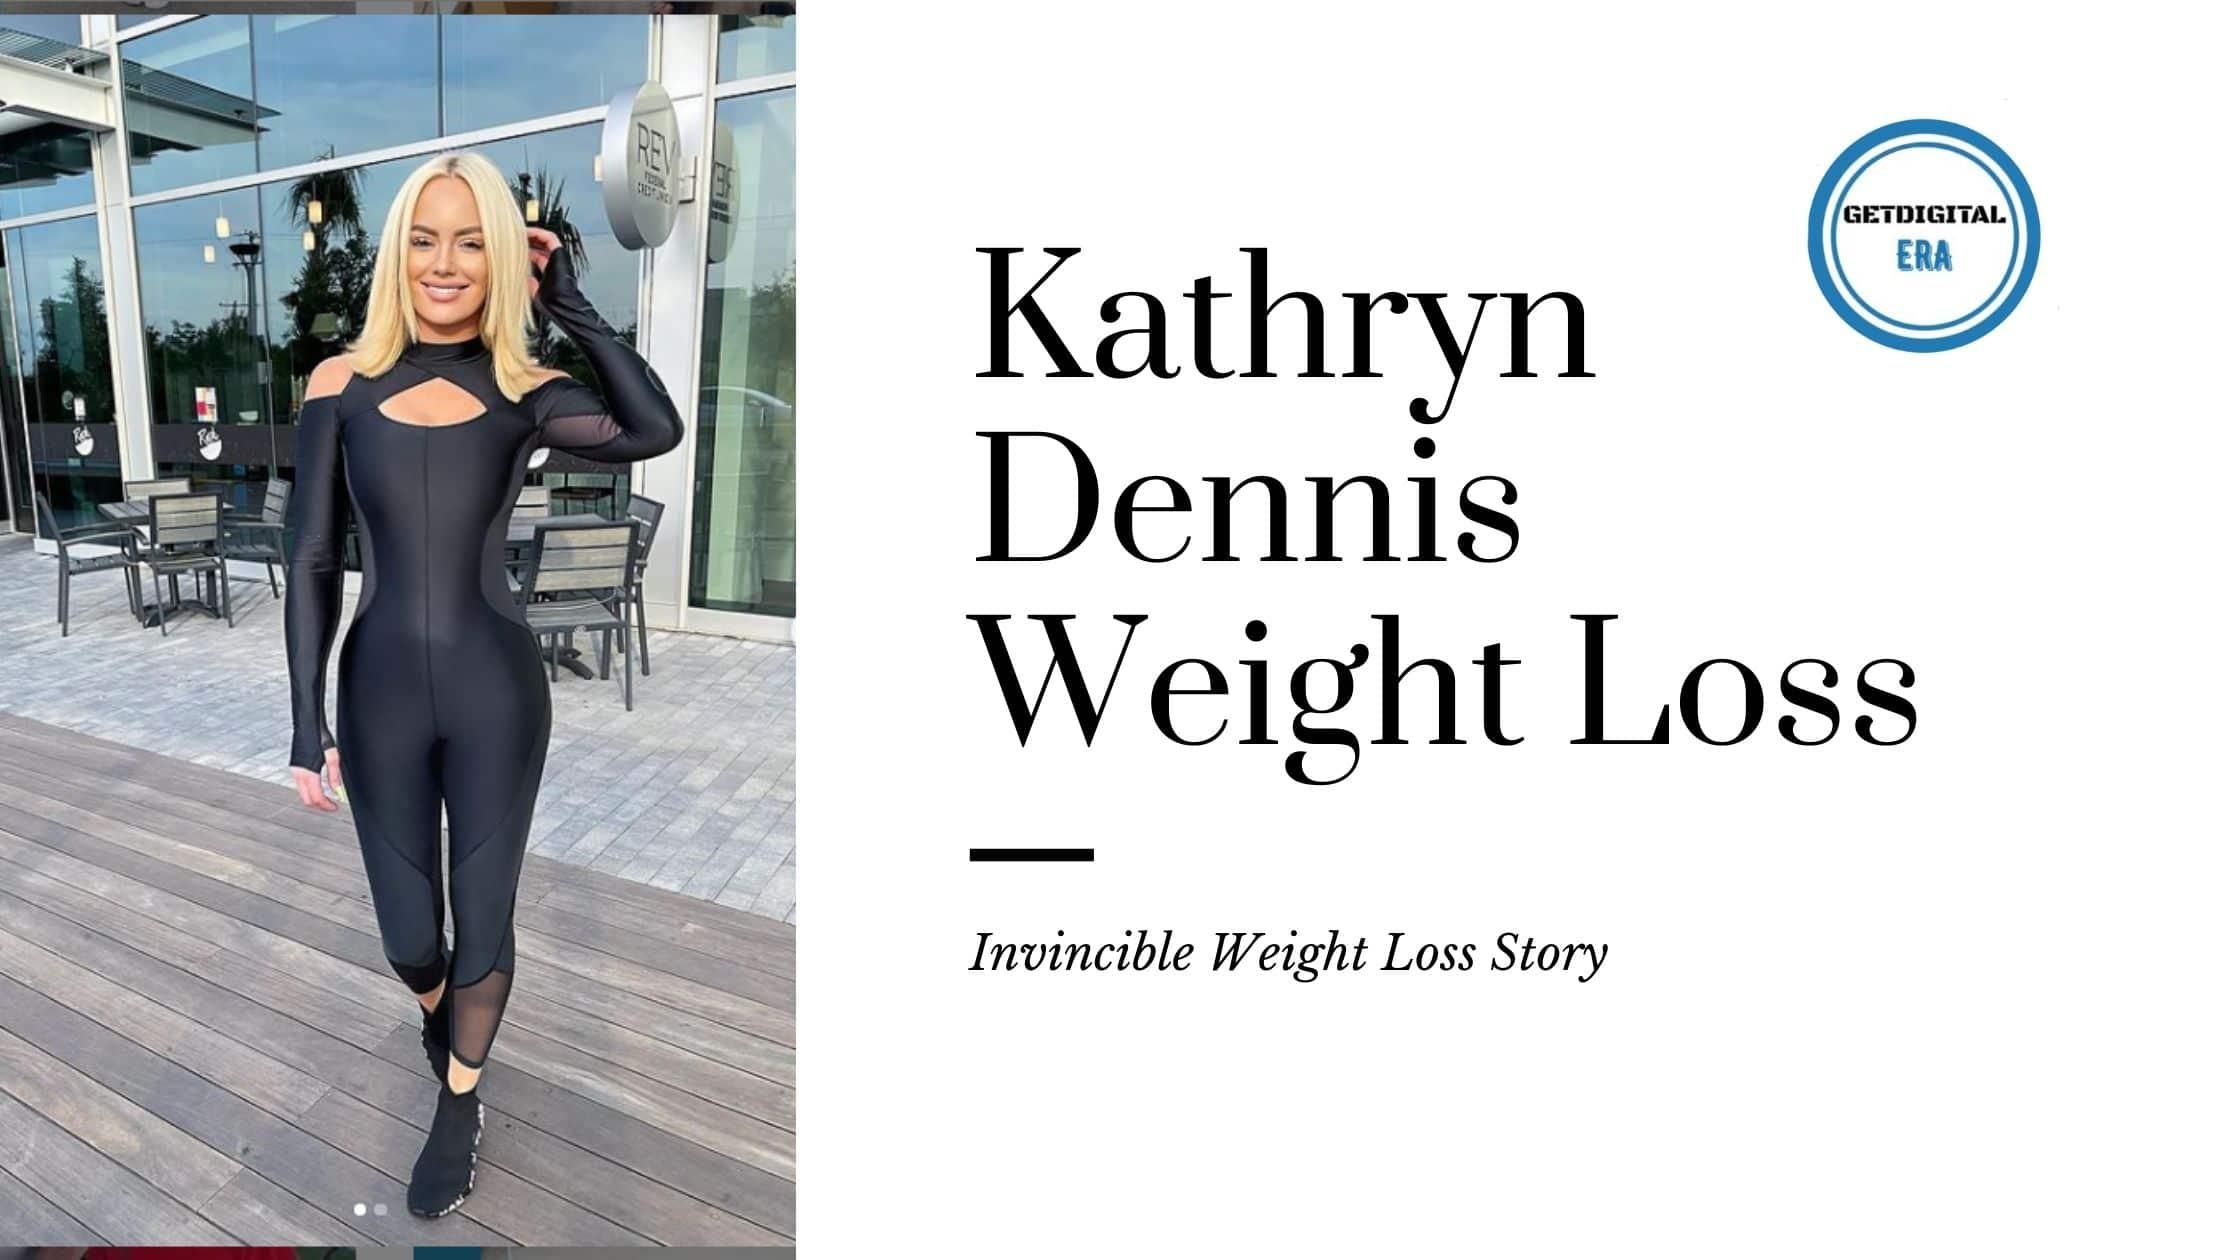 Kathryn Dennis Weight Loss